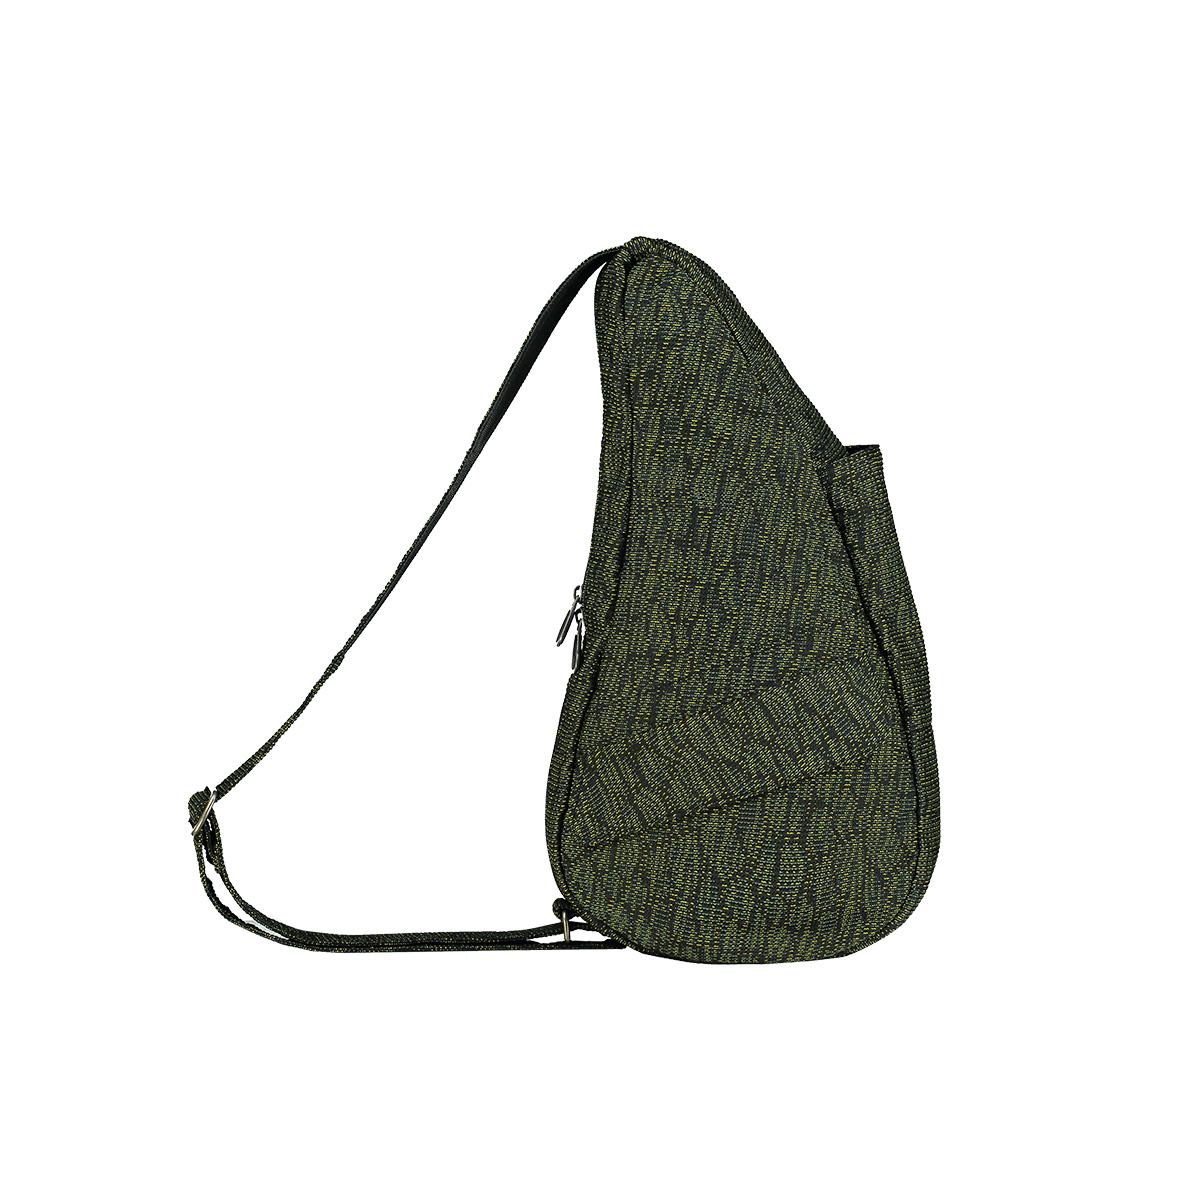 Healthy Back Bag/ヘルシーバックバッグ/ショルダーバッグ/ボディバッグ/旅行バッグ/軽量/レディース/メンズ 《限定ポーチ付》 公式ストア ヘルシーバックバッグ リュージョン Sサイズ グリーン